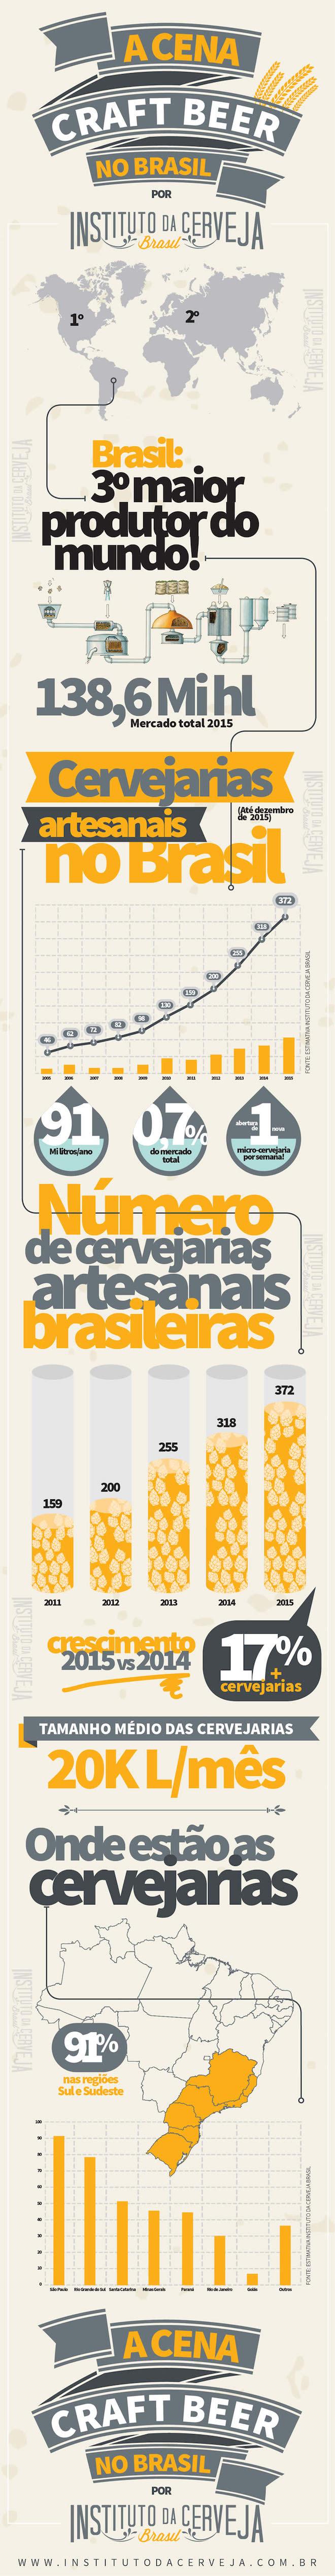 microcervejarias-brasil-numeros-pesquisa-infografico-instituto-da-cerveja